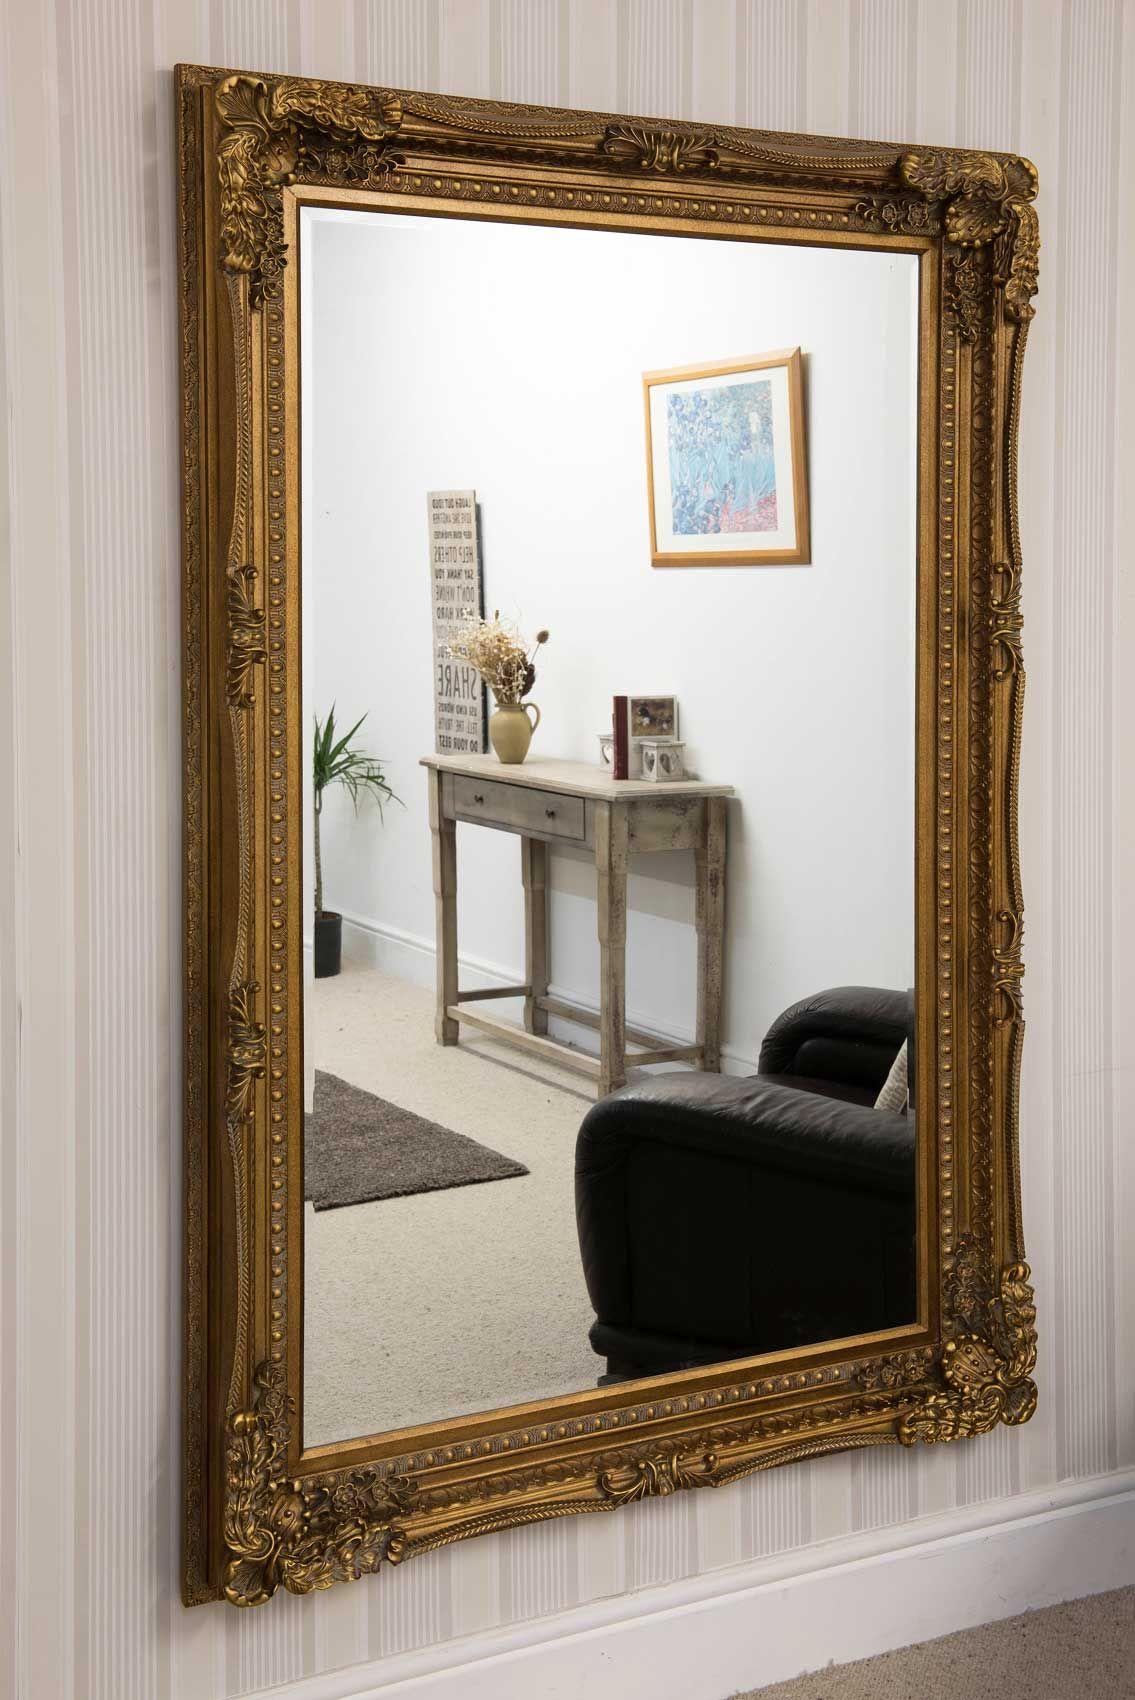 093414e8228 Charlton Gold Framed Mirror 123x175cm - Soraya Interiors UK Large Mirrors  For Sale